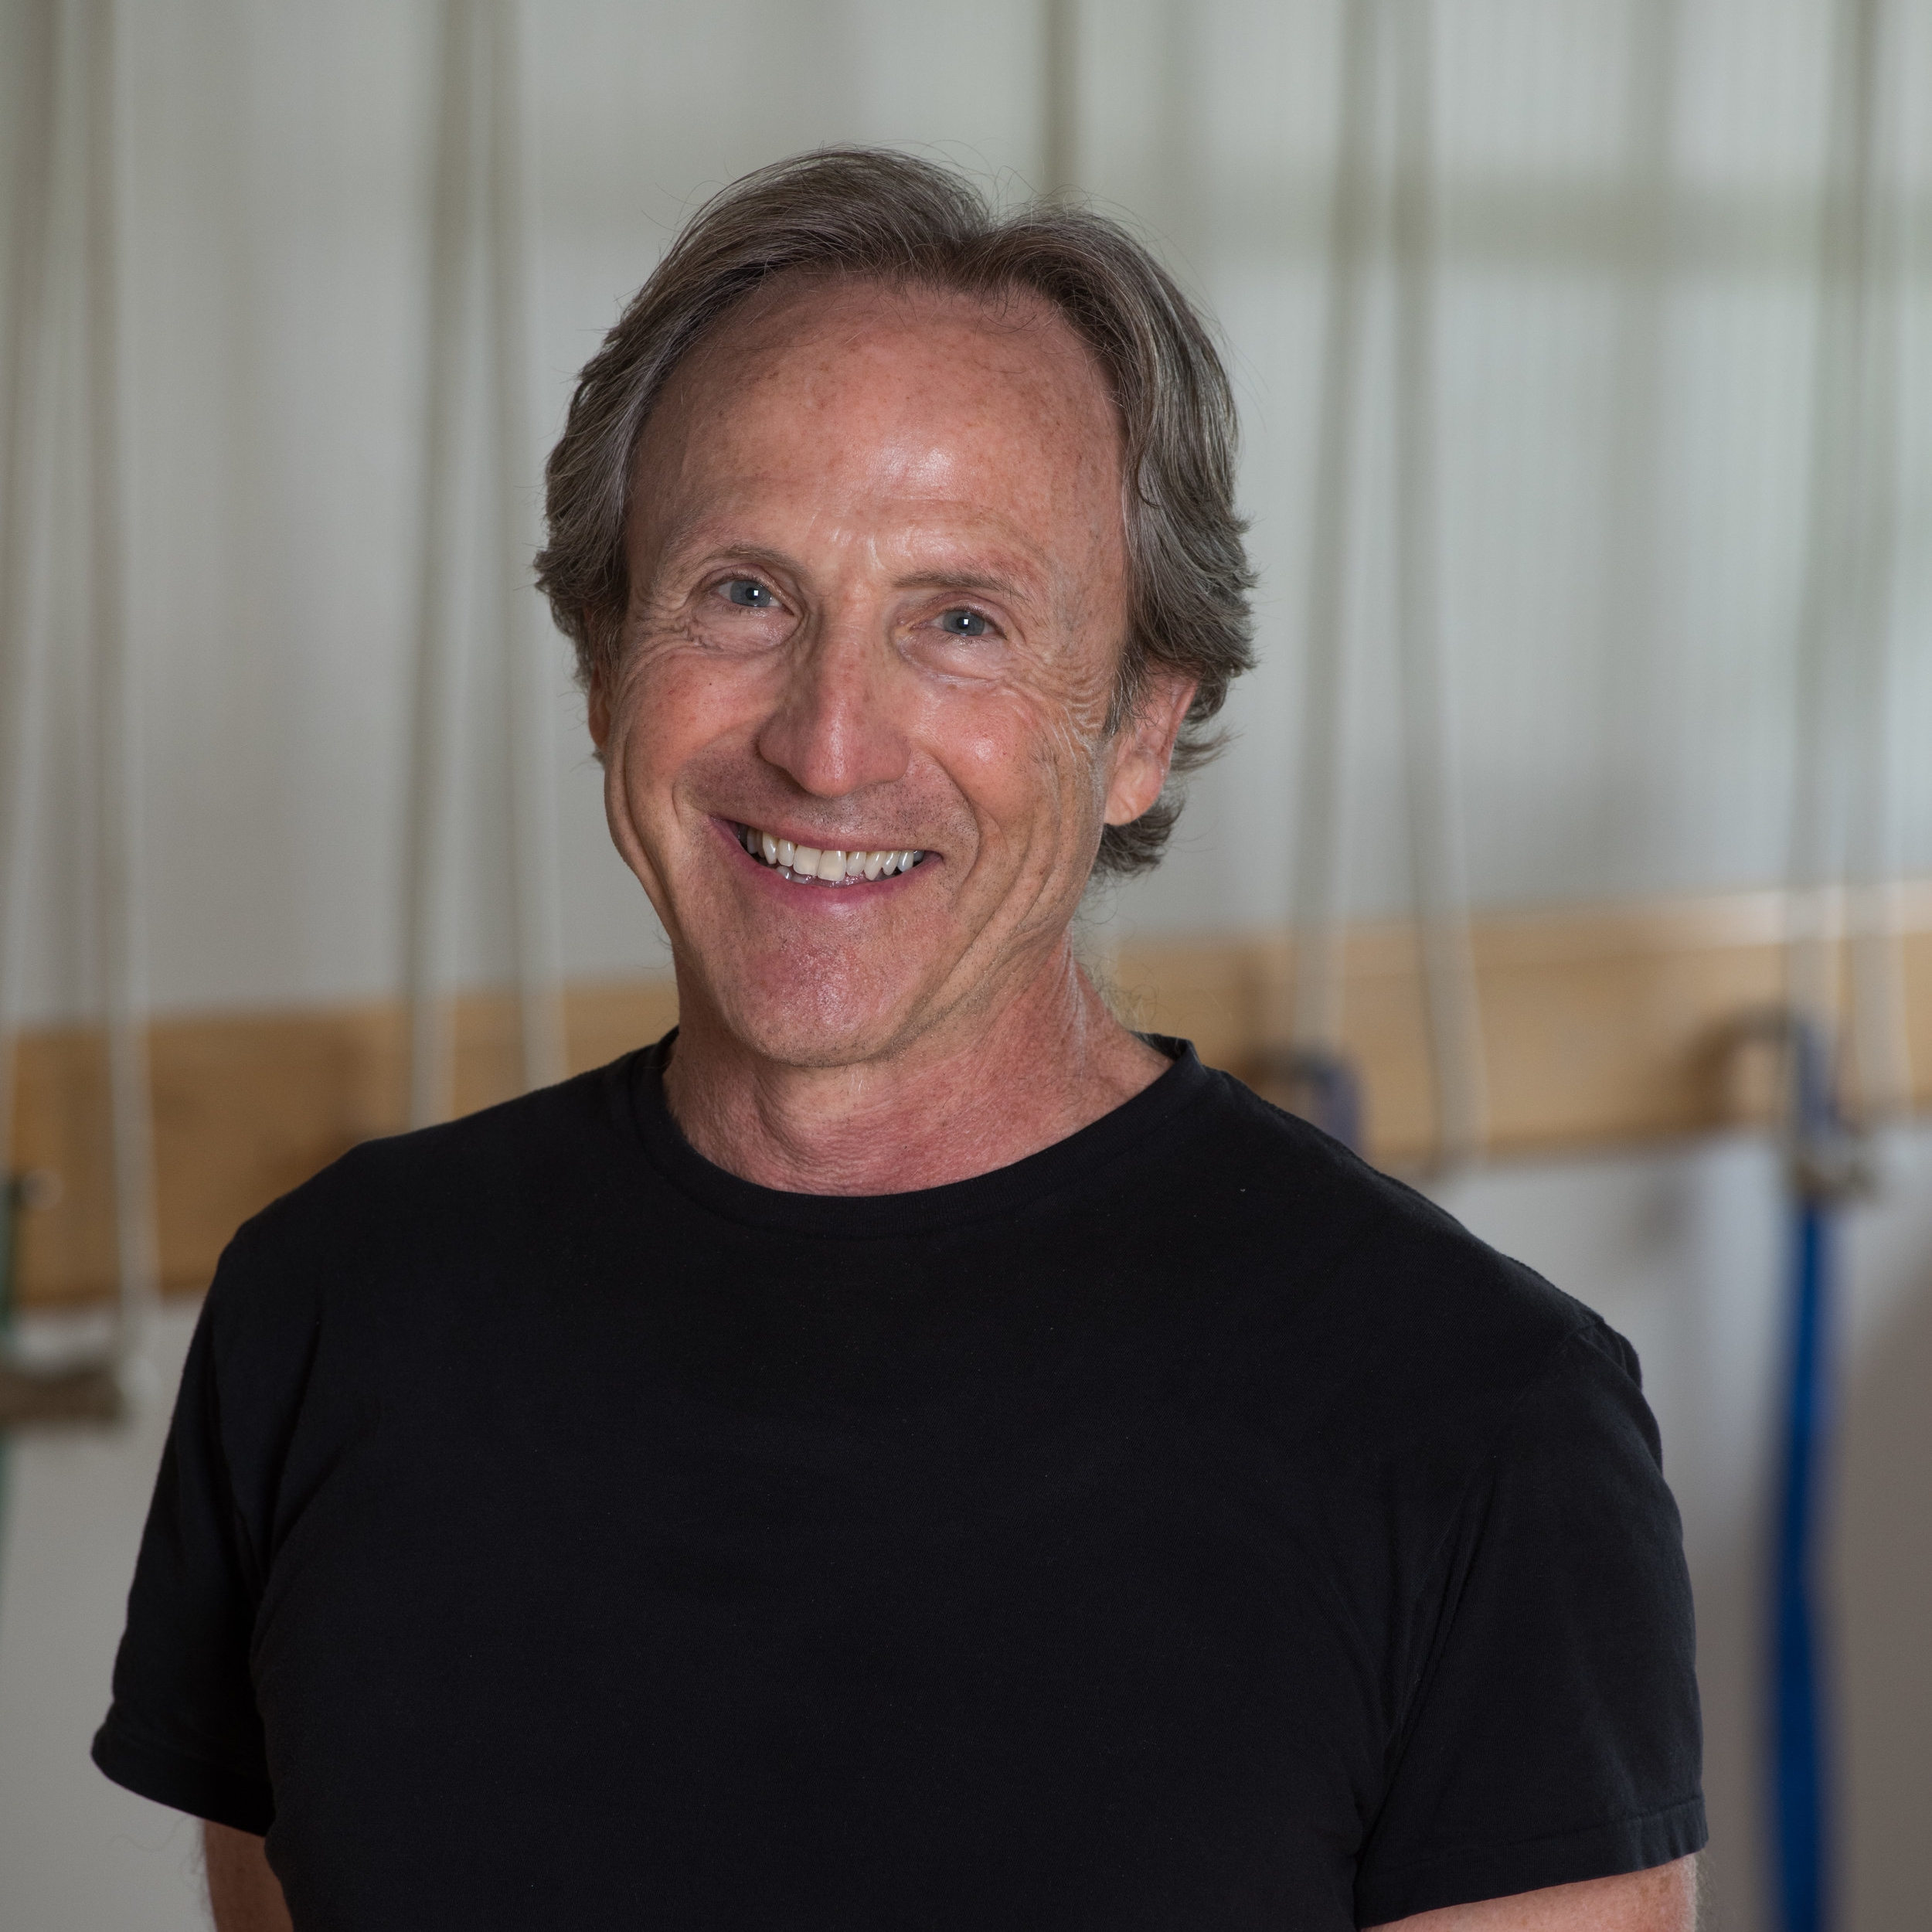 David Ufer